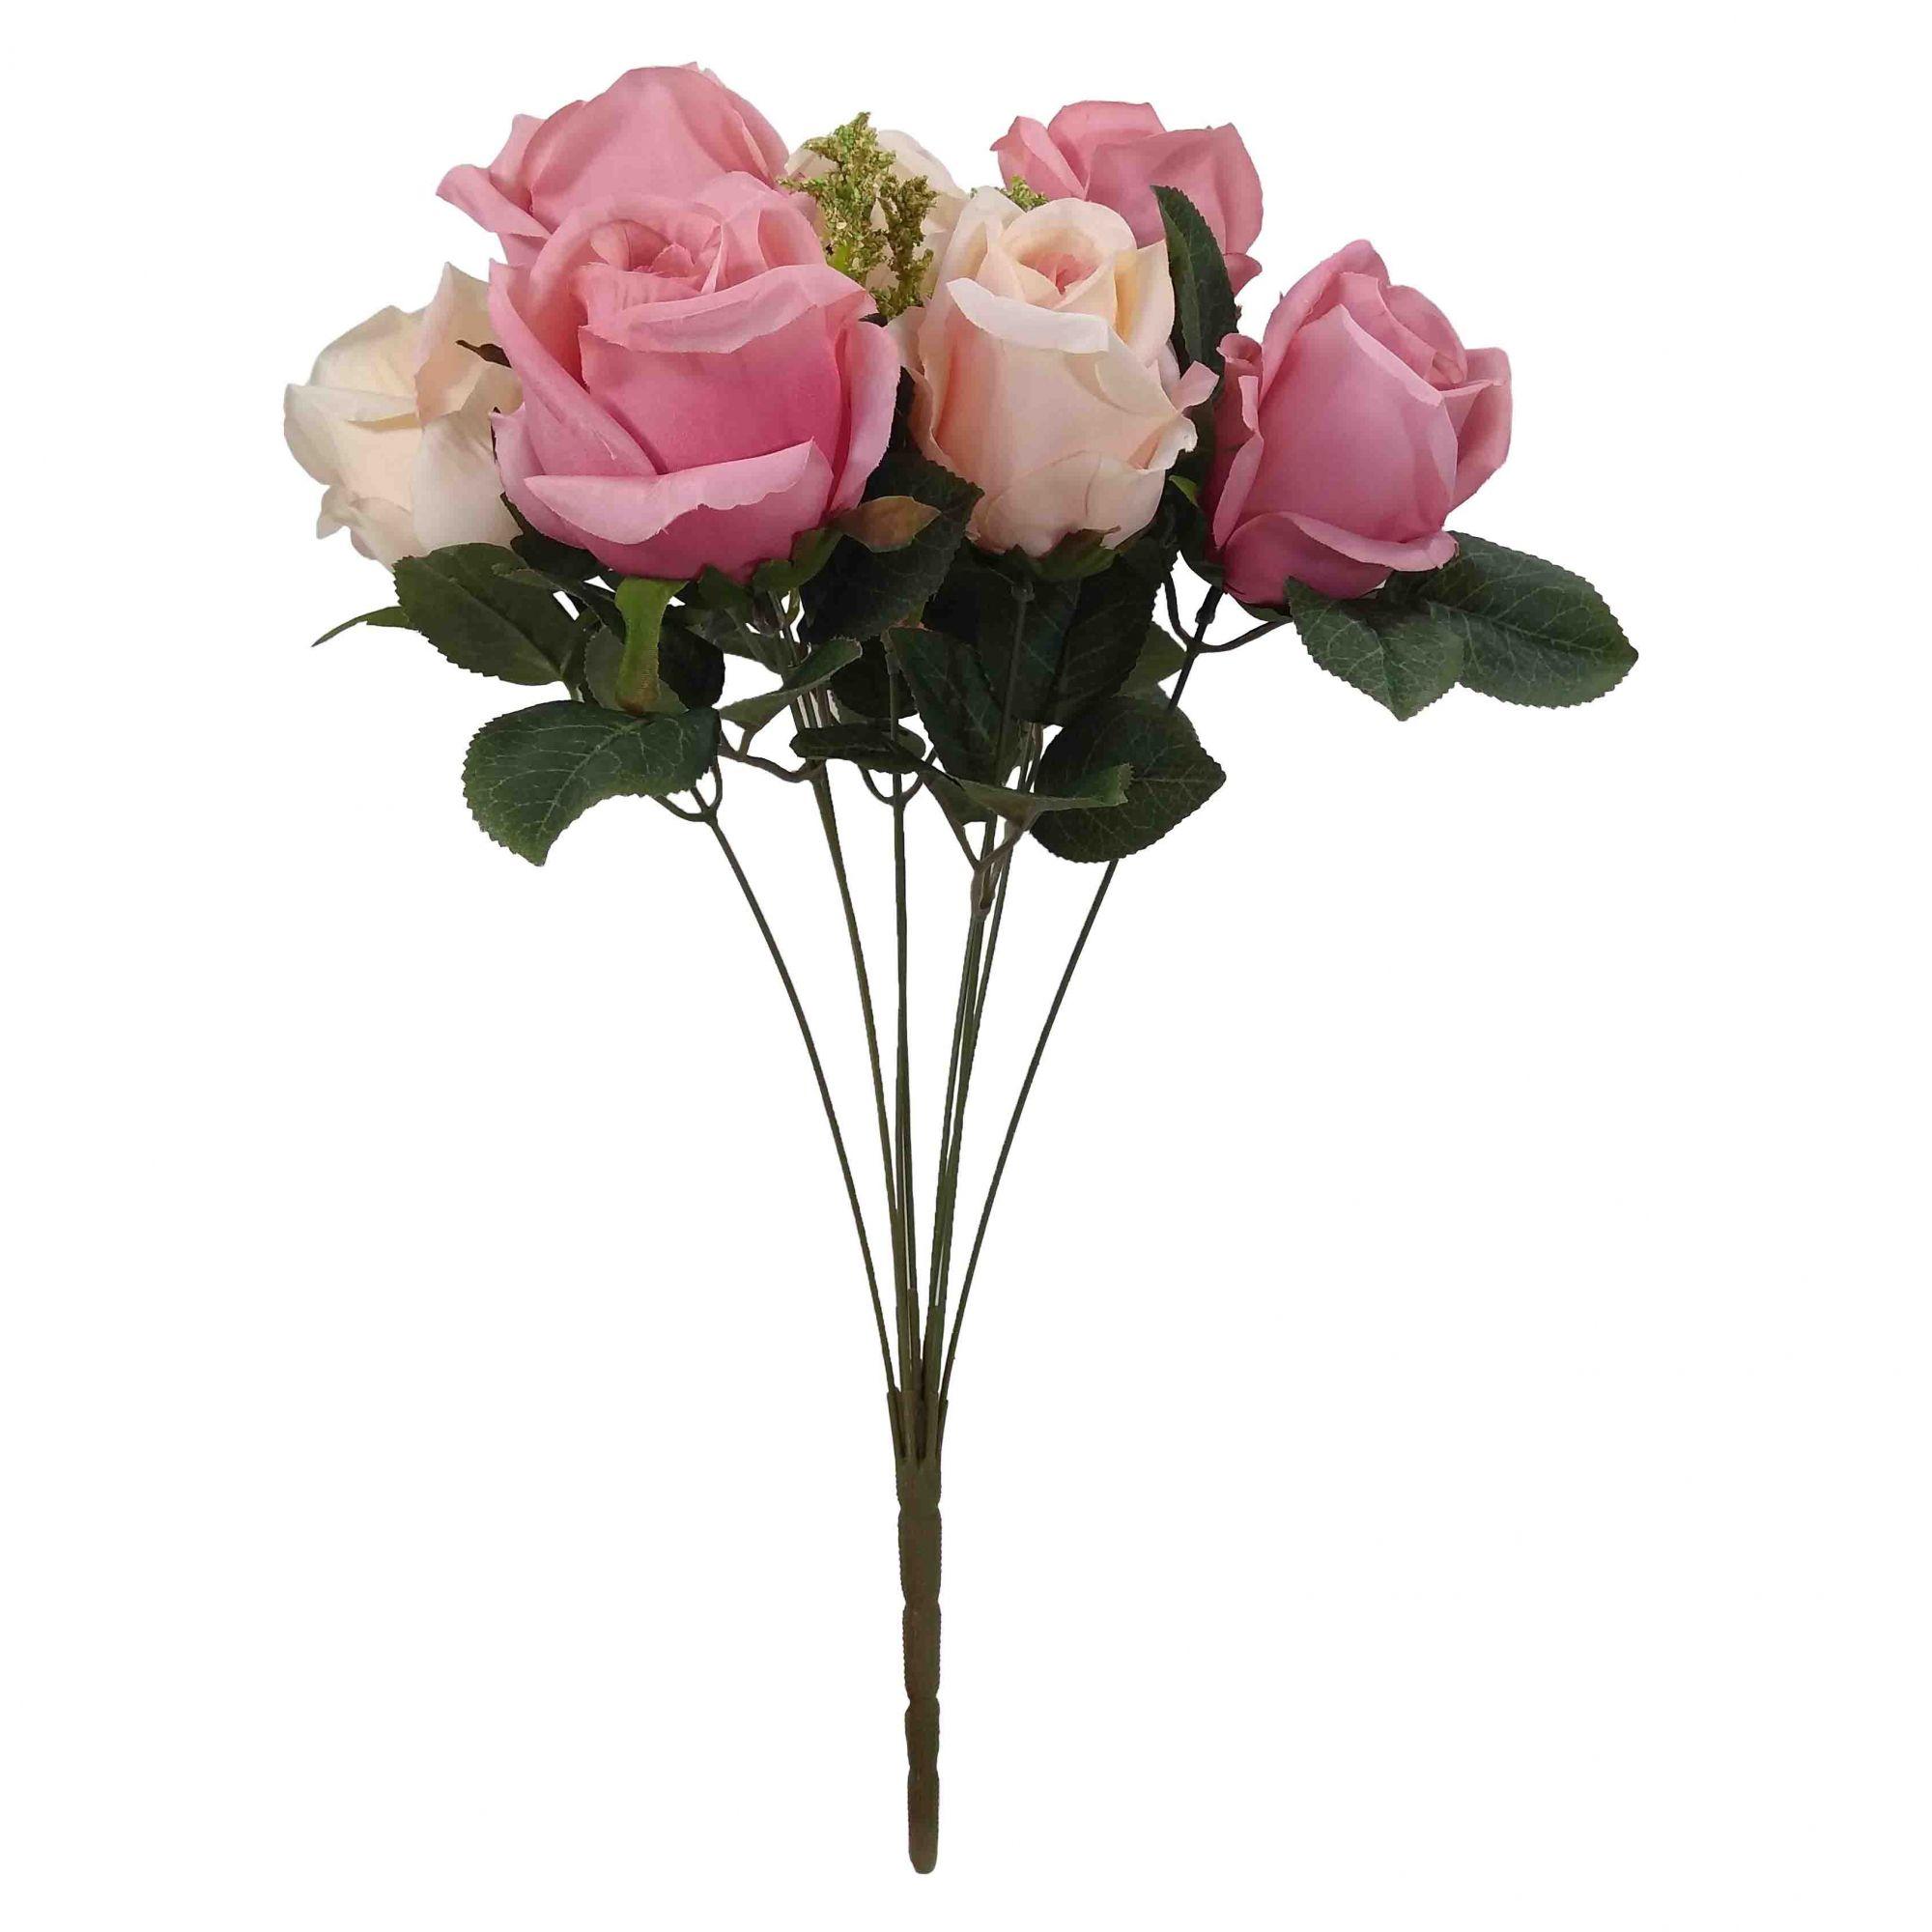 Flor Rosa Cor Rosa Outono 2 Tons Artificial Permanente 52CM 36435-010